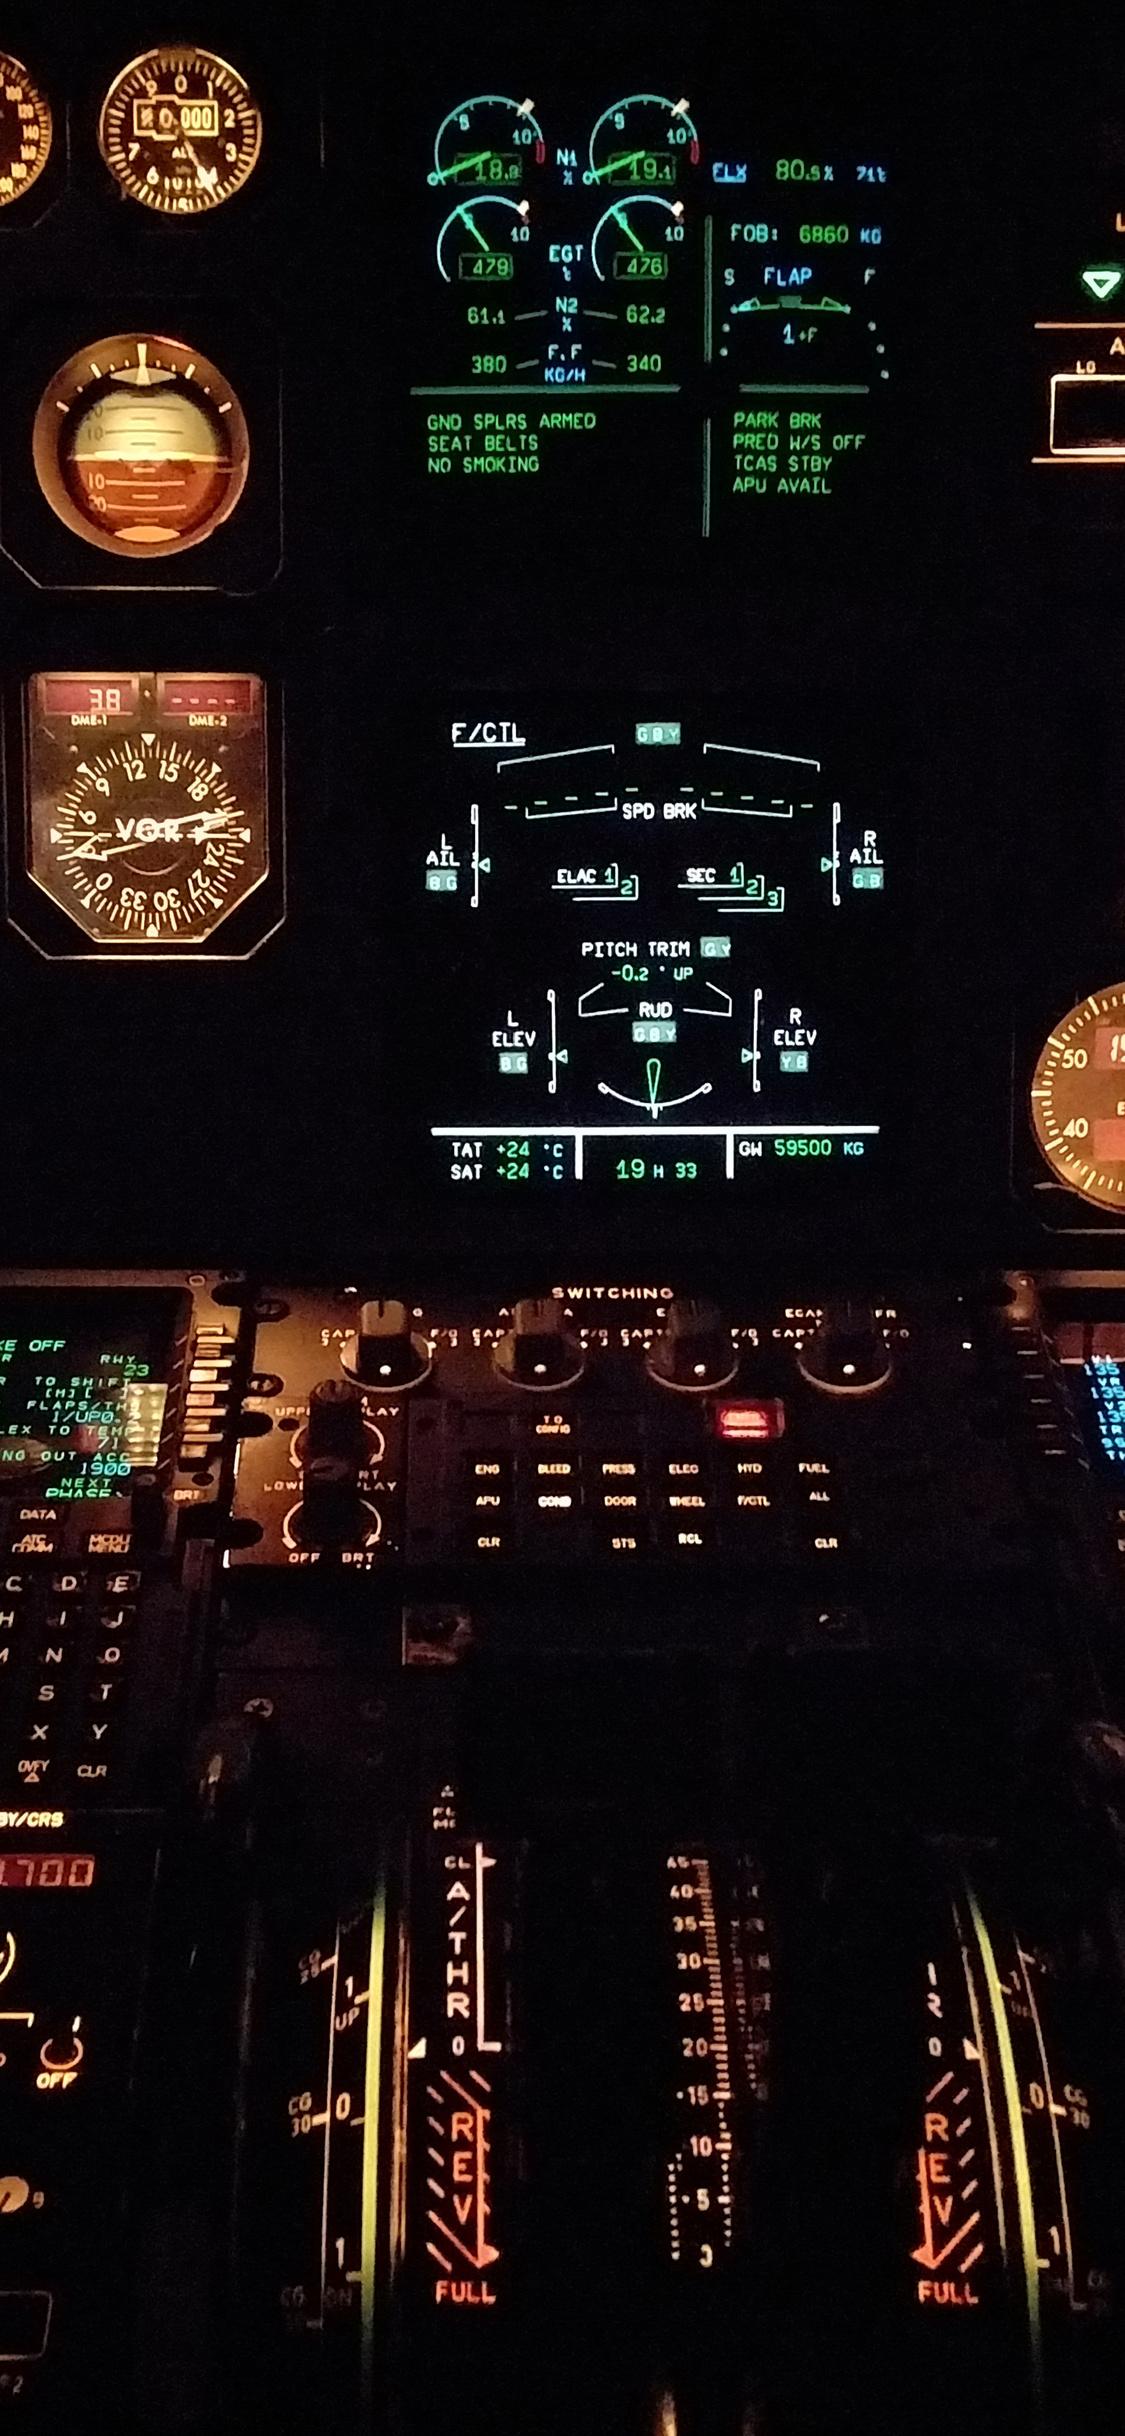 1125x2436 cockpit 4k iphone xs iphone 10 iphone x hd 4k - 4k cockpit wallpaper ...